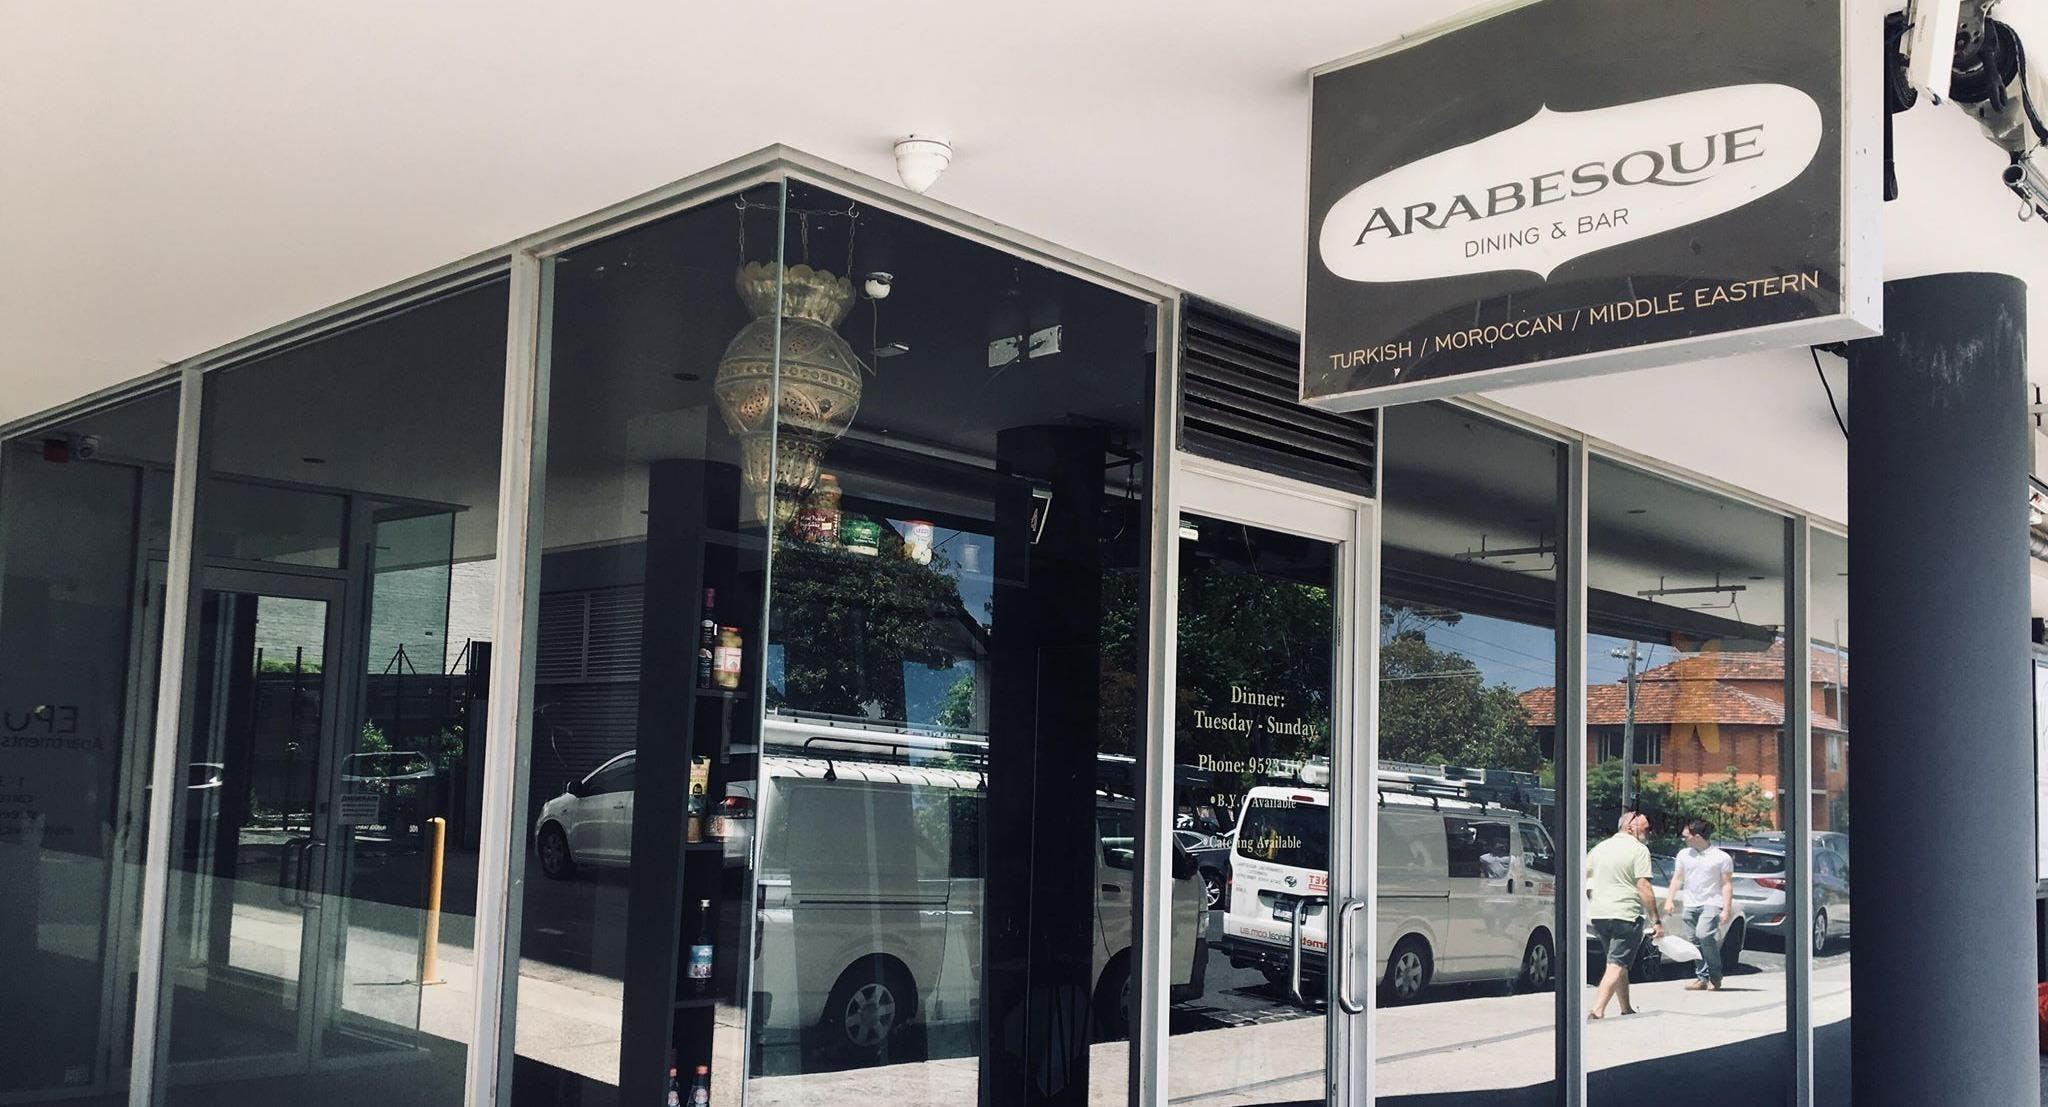 Arabesque Dining & Bar Melbourne image 2